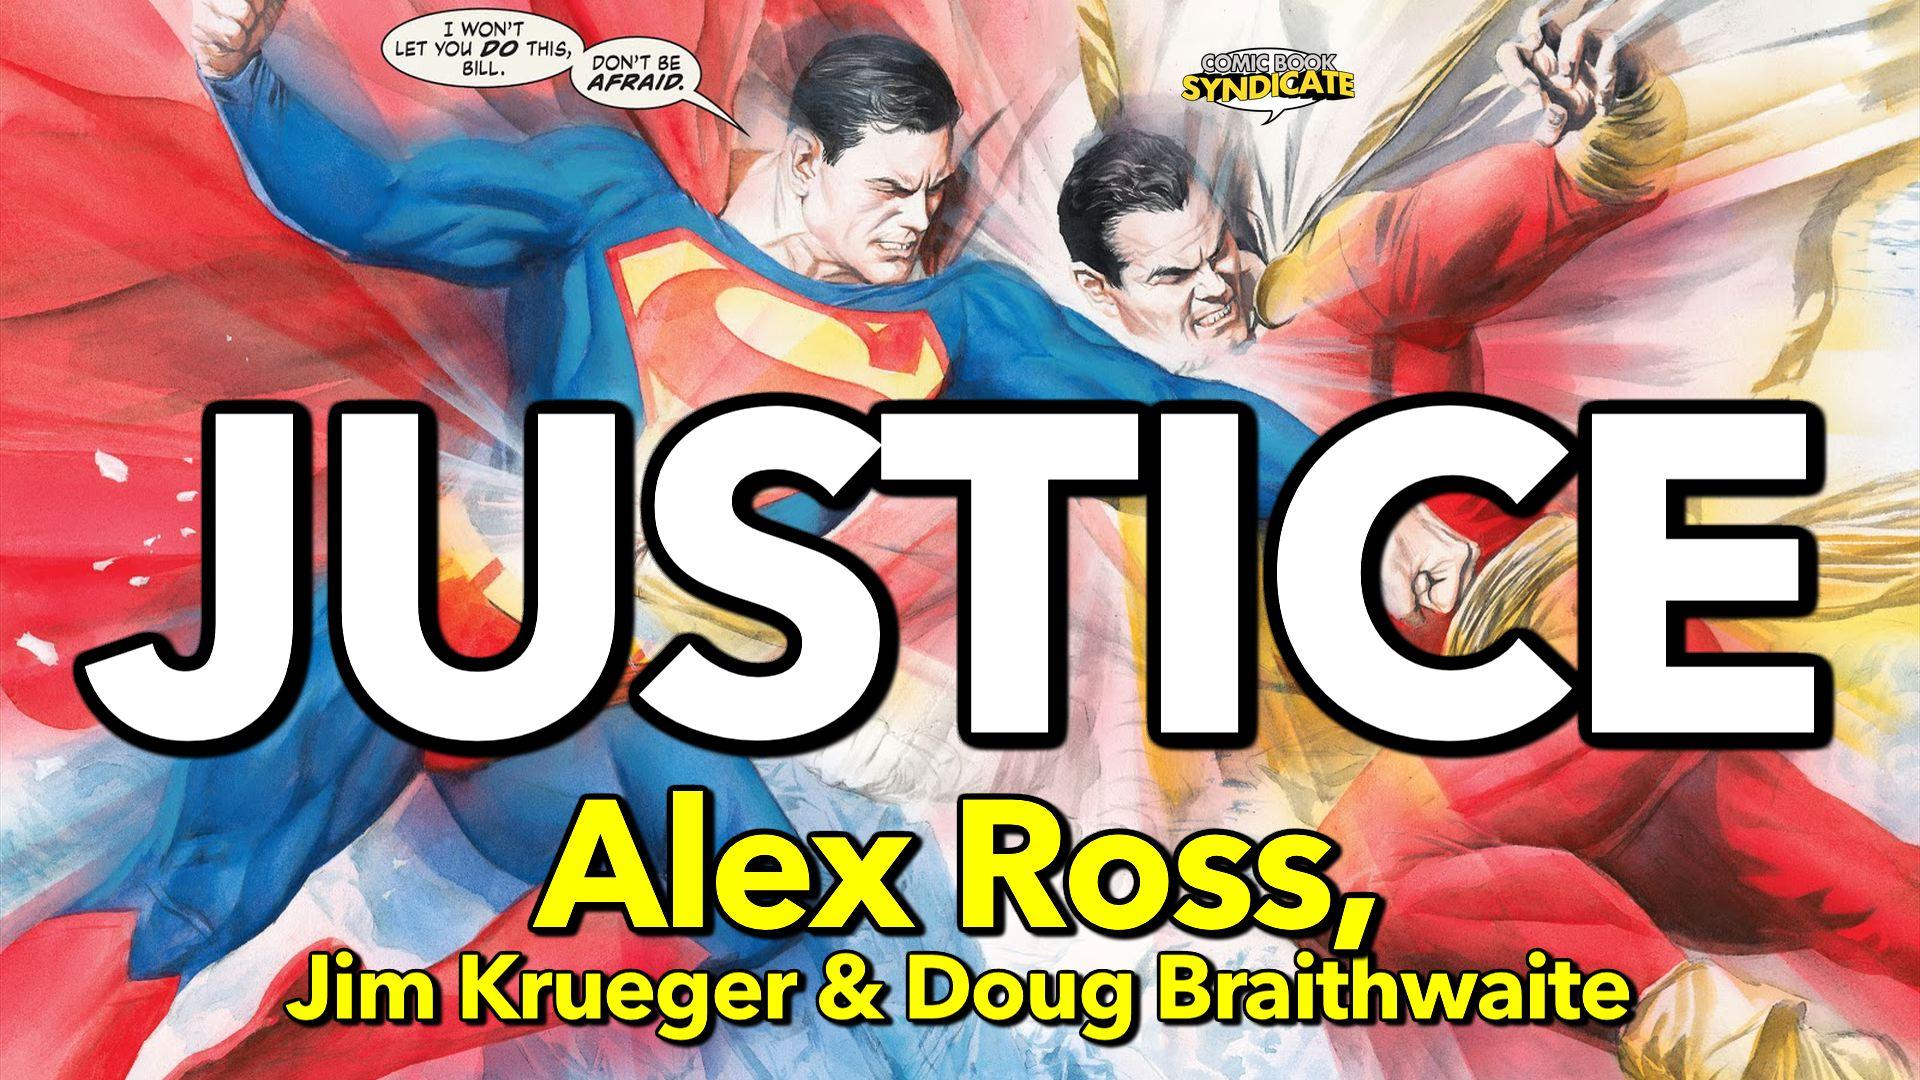 JUSTICE (Alex Ross)